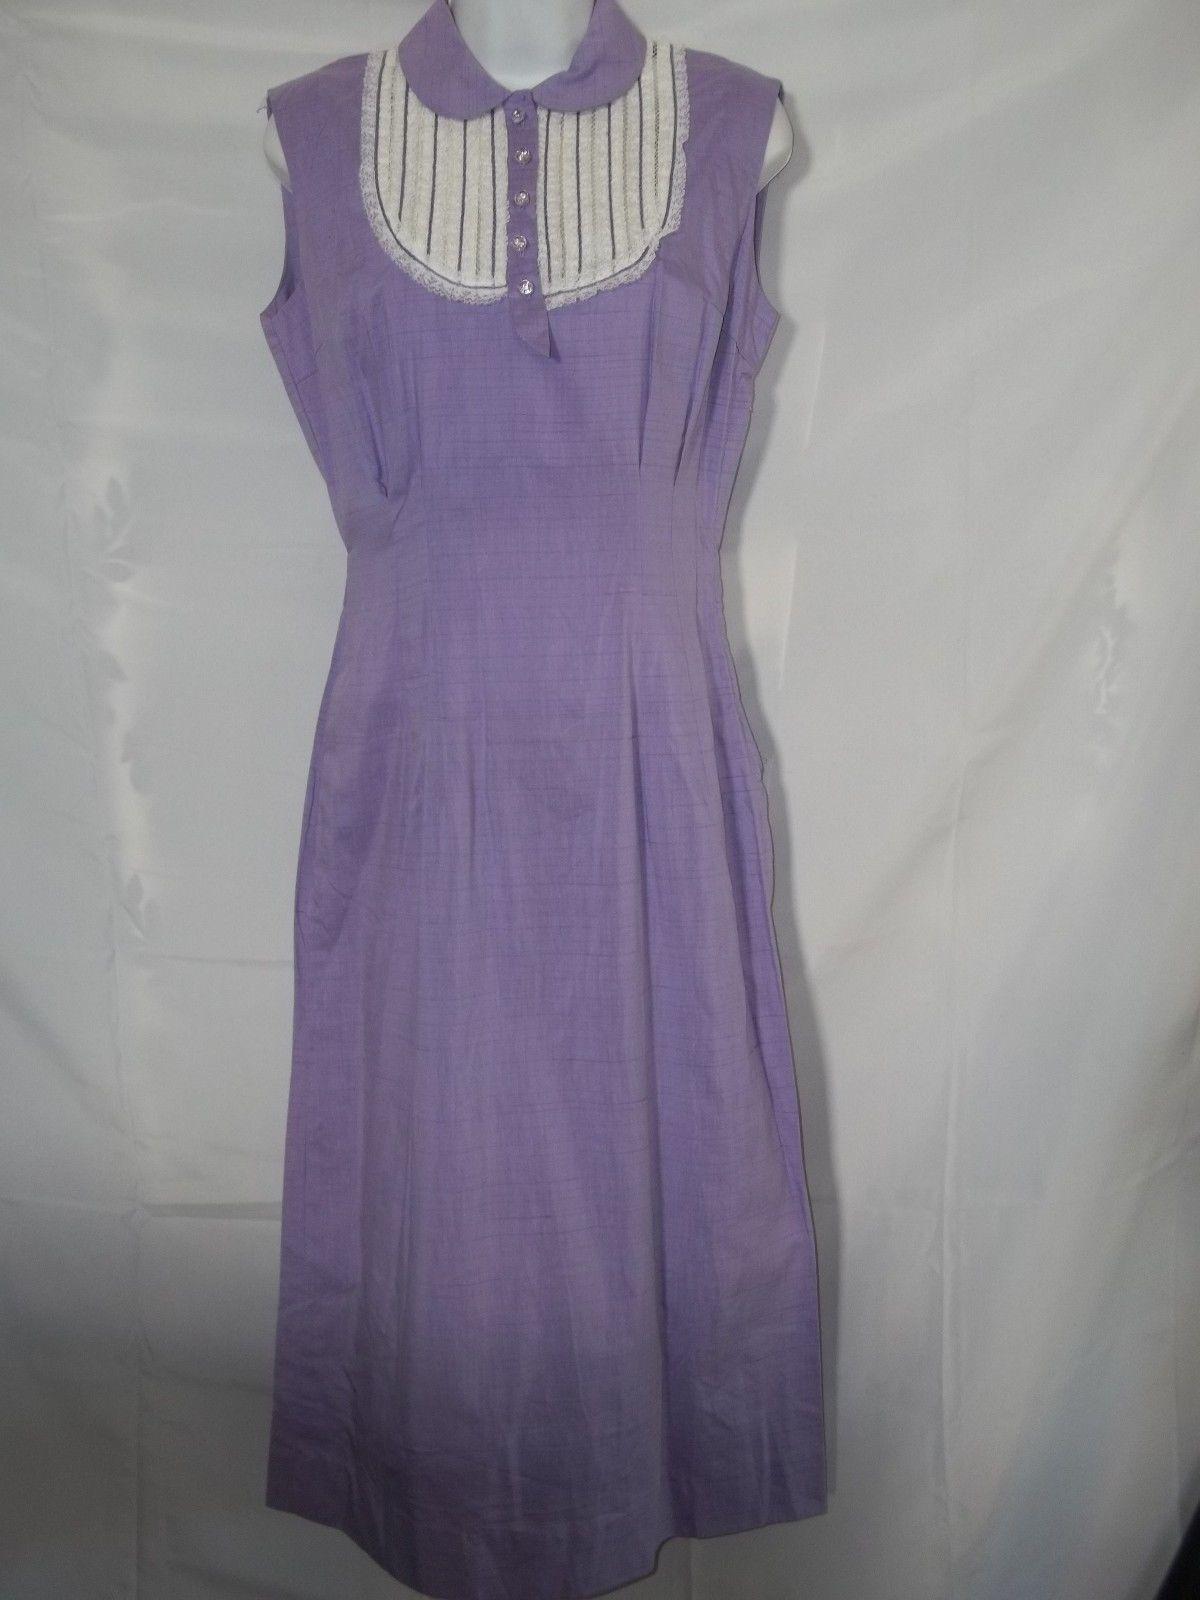 7e0995b2c92b S l1600. S l1600. Previous. Ladies Junior 13 Vicky Vaughn Lilac Summer  Vintage Cotton 50 s Style Dress. Ladies Junior 13 Vicky ...